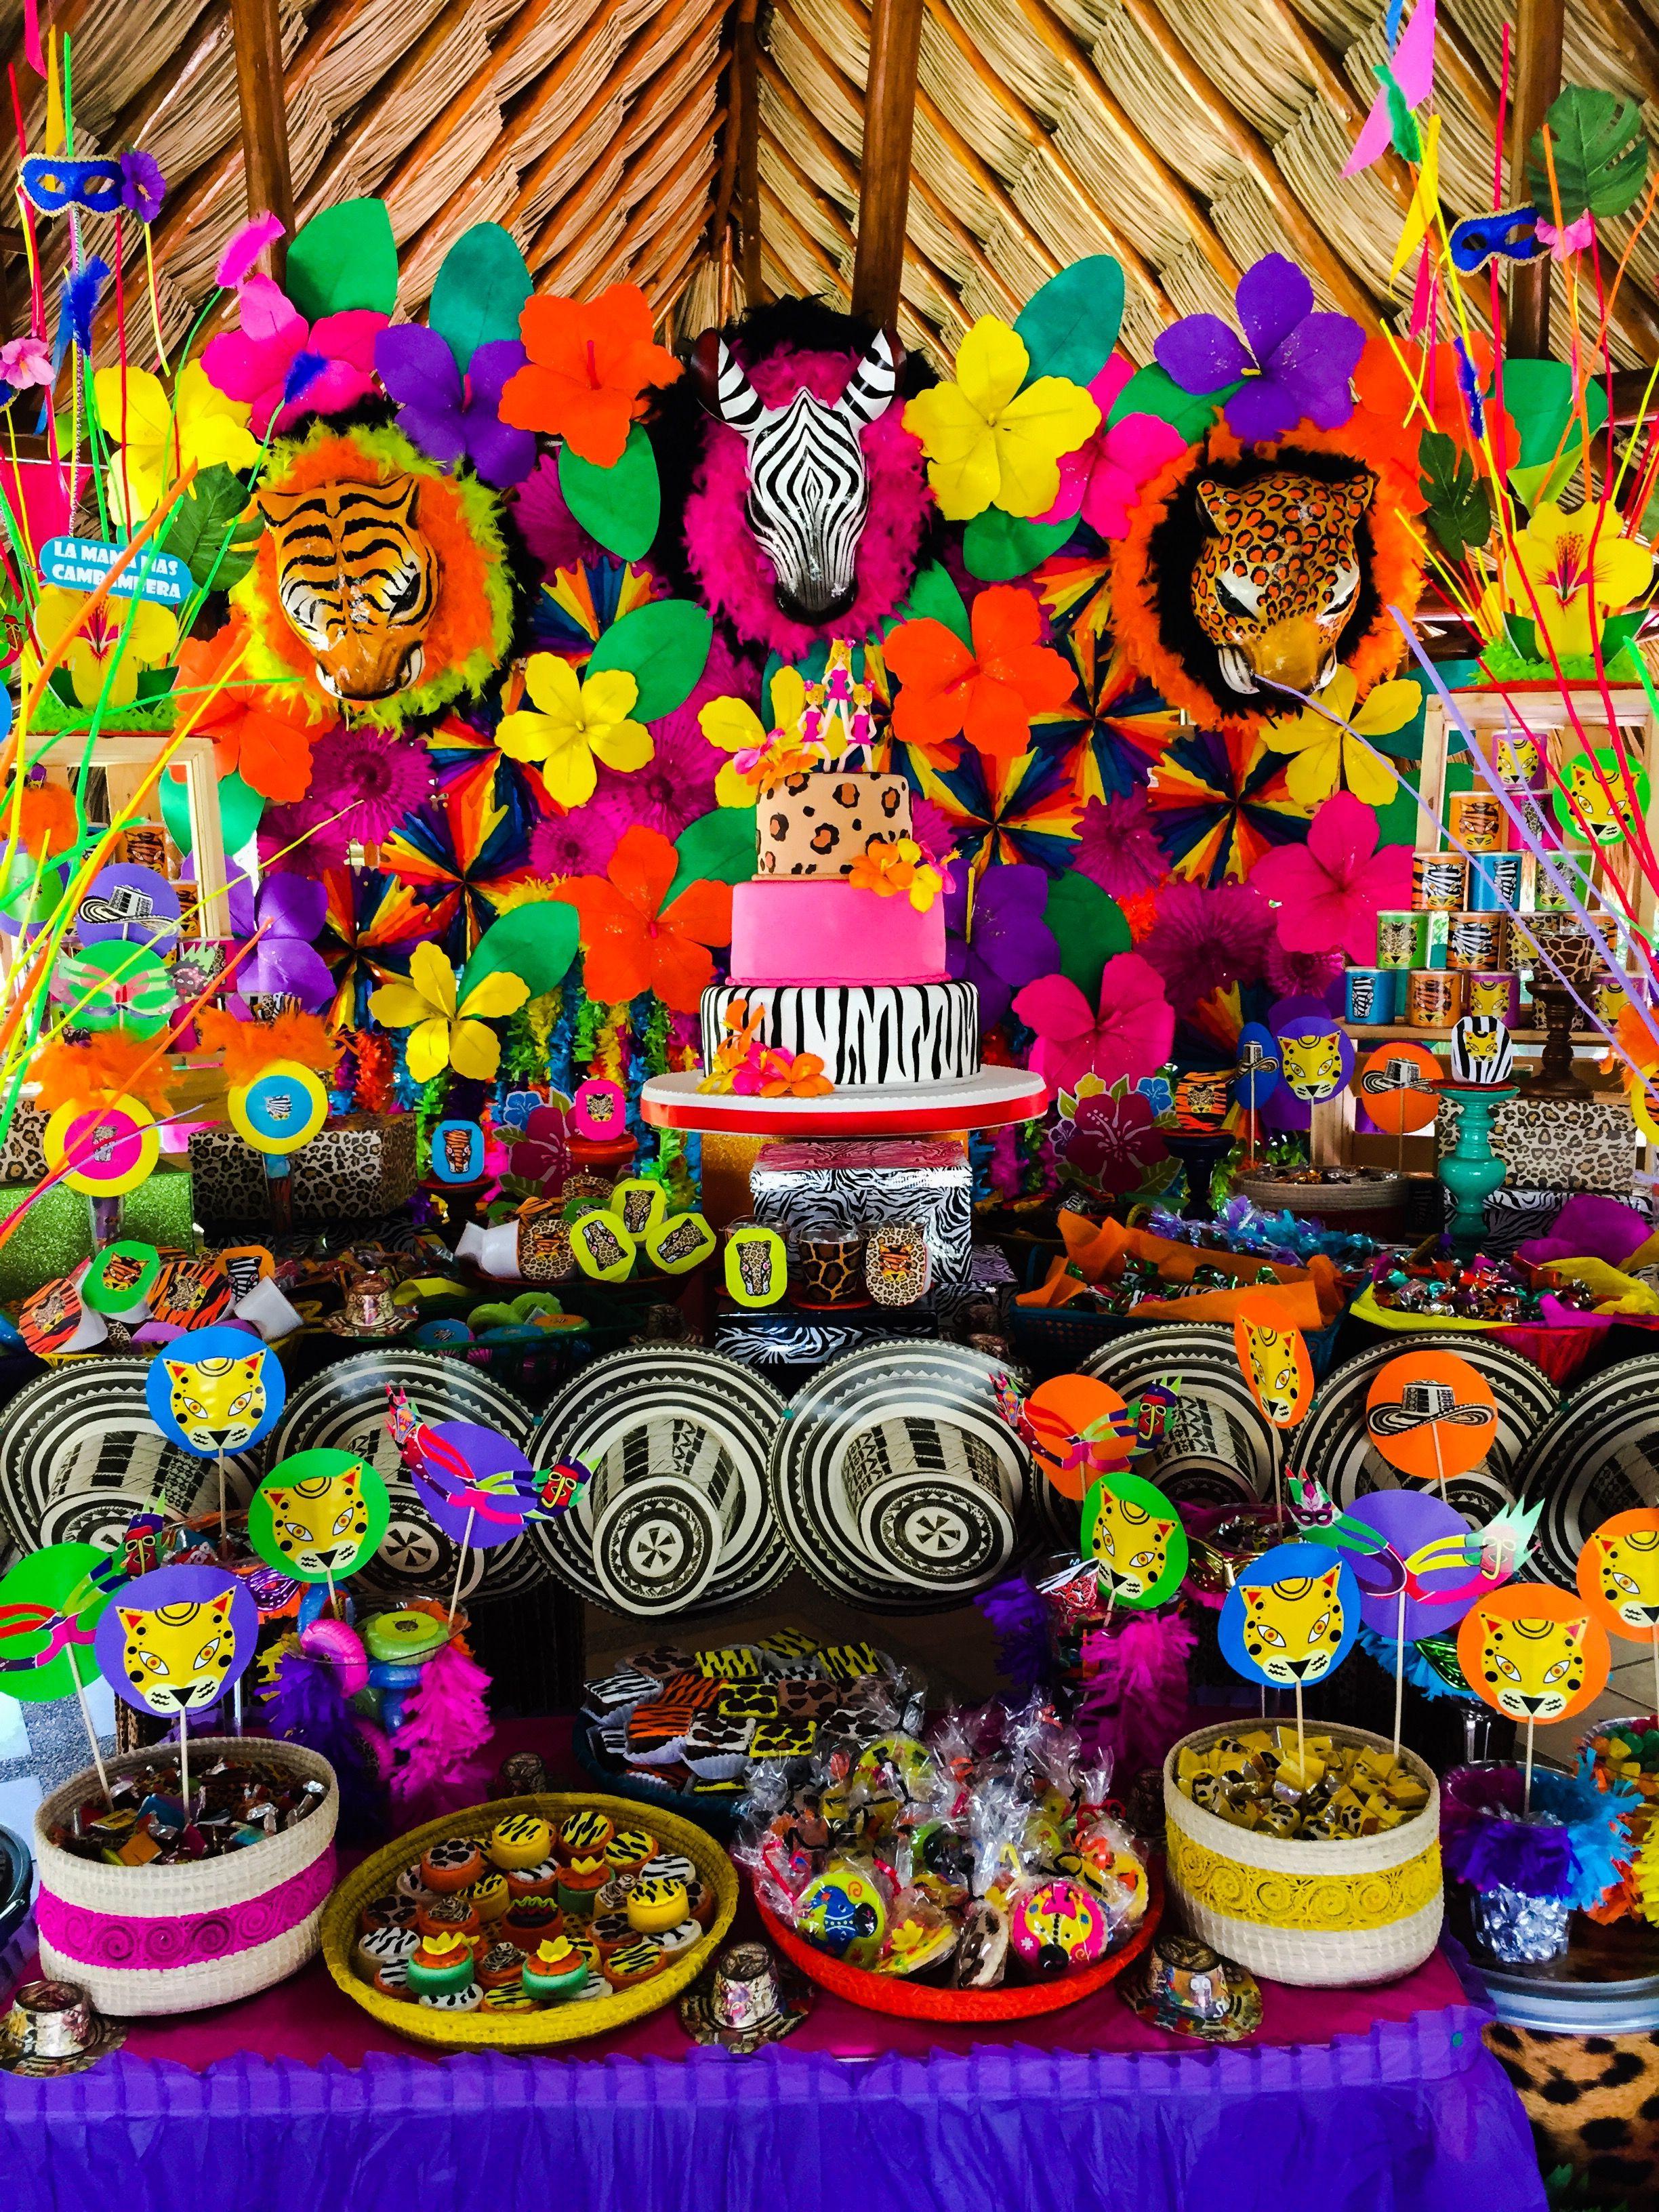 Pin De Vidafiestascg En Carnaval De Barranquilla